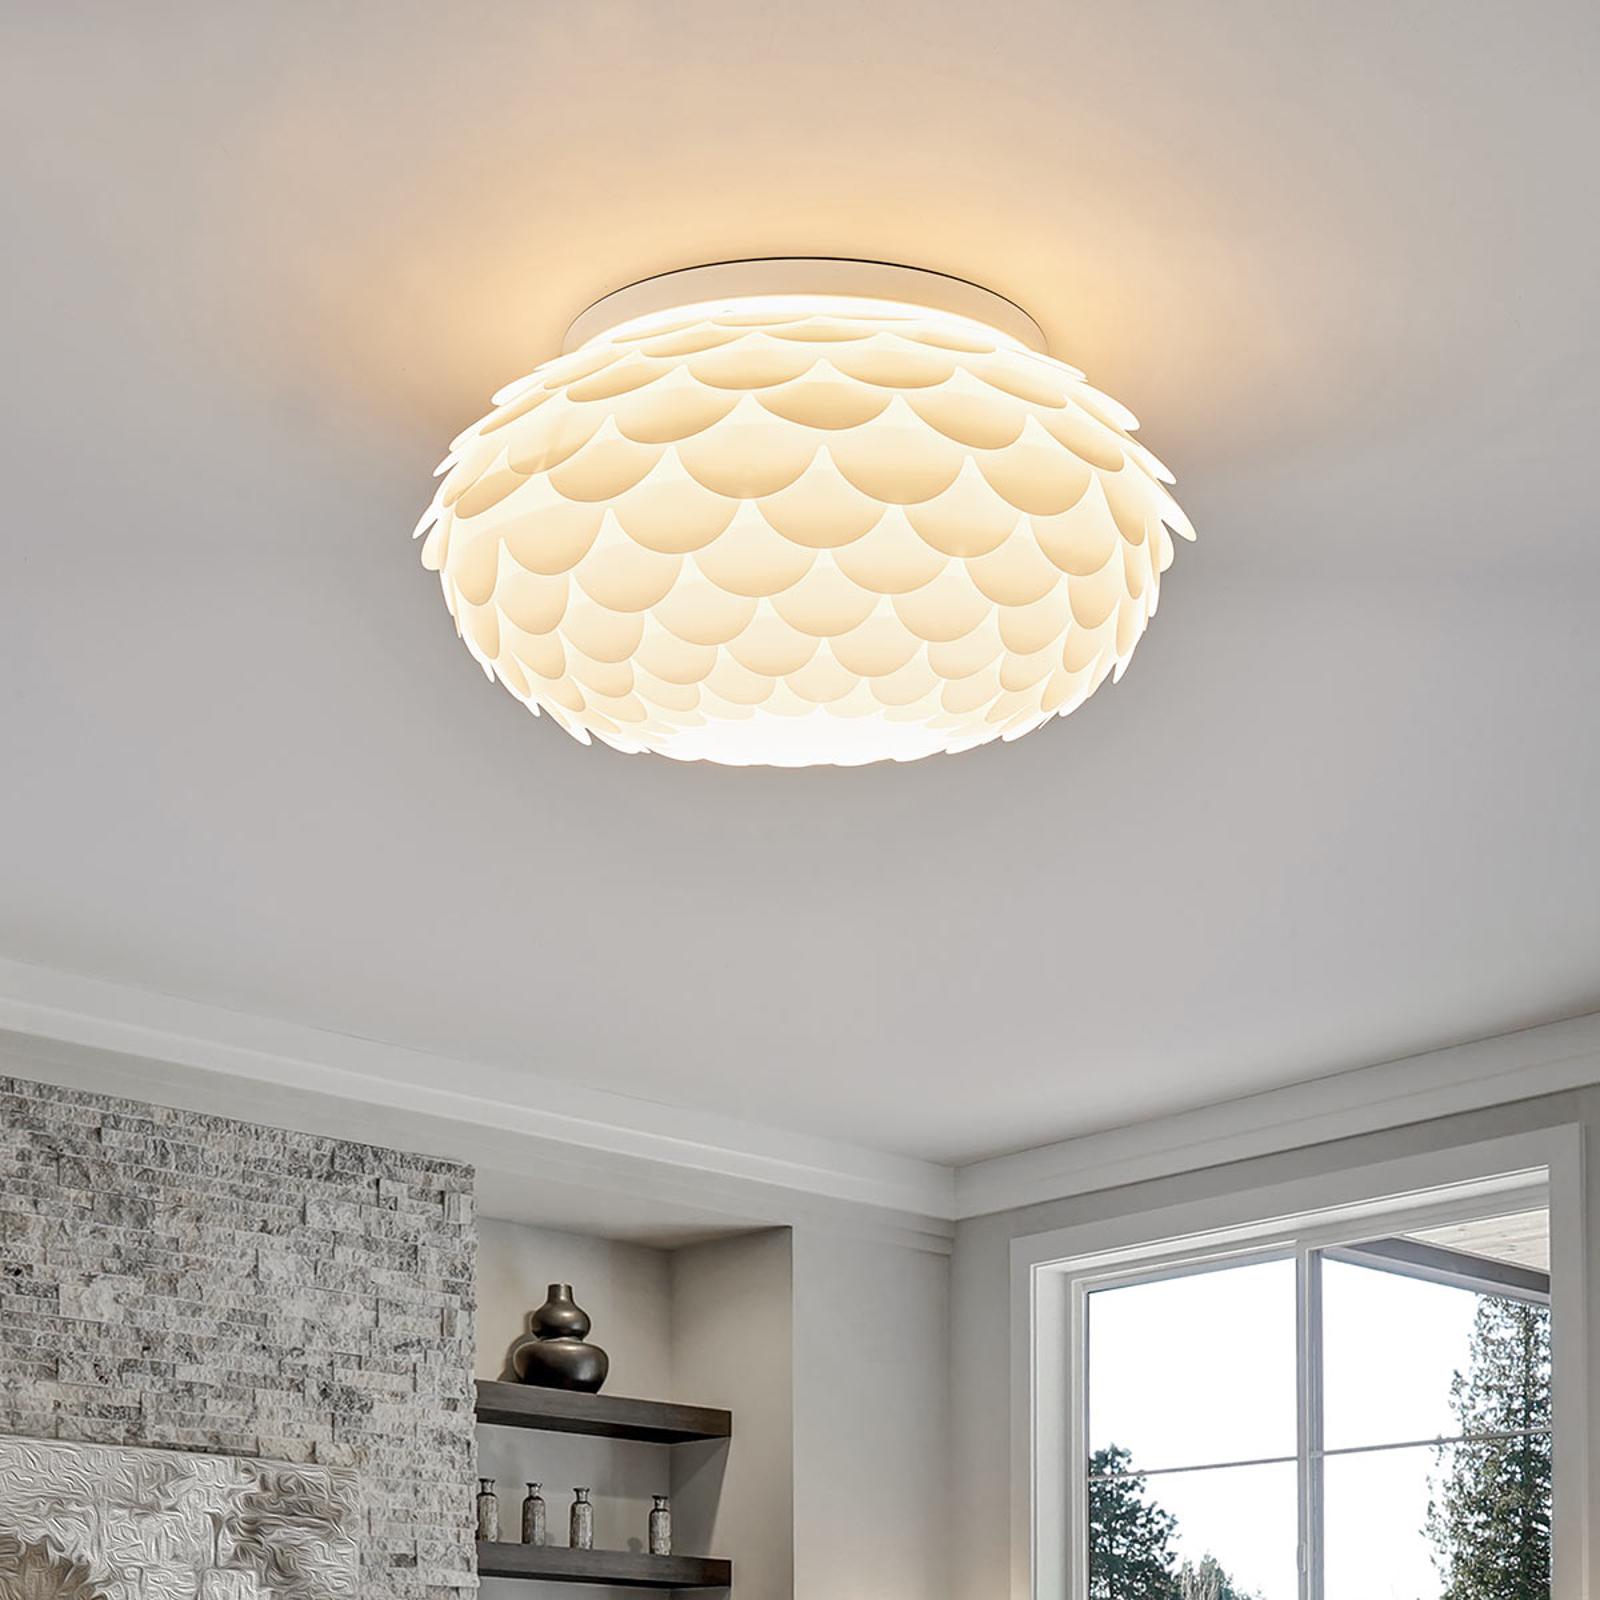 Lampa sufitowa Marees, biała, okrągła